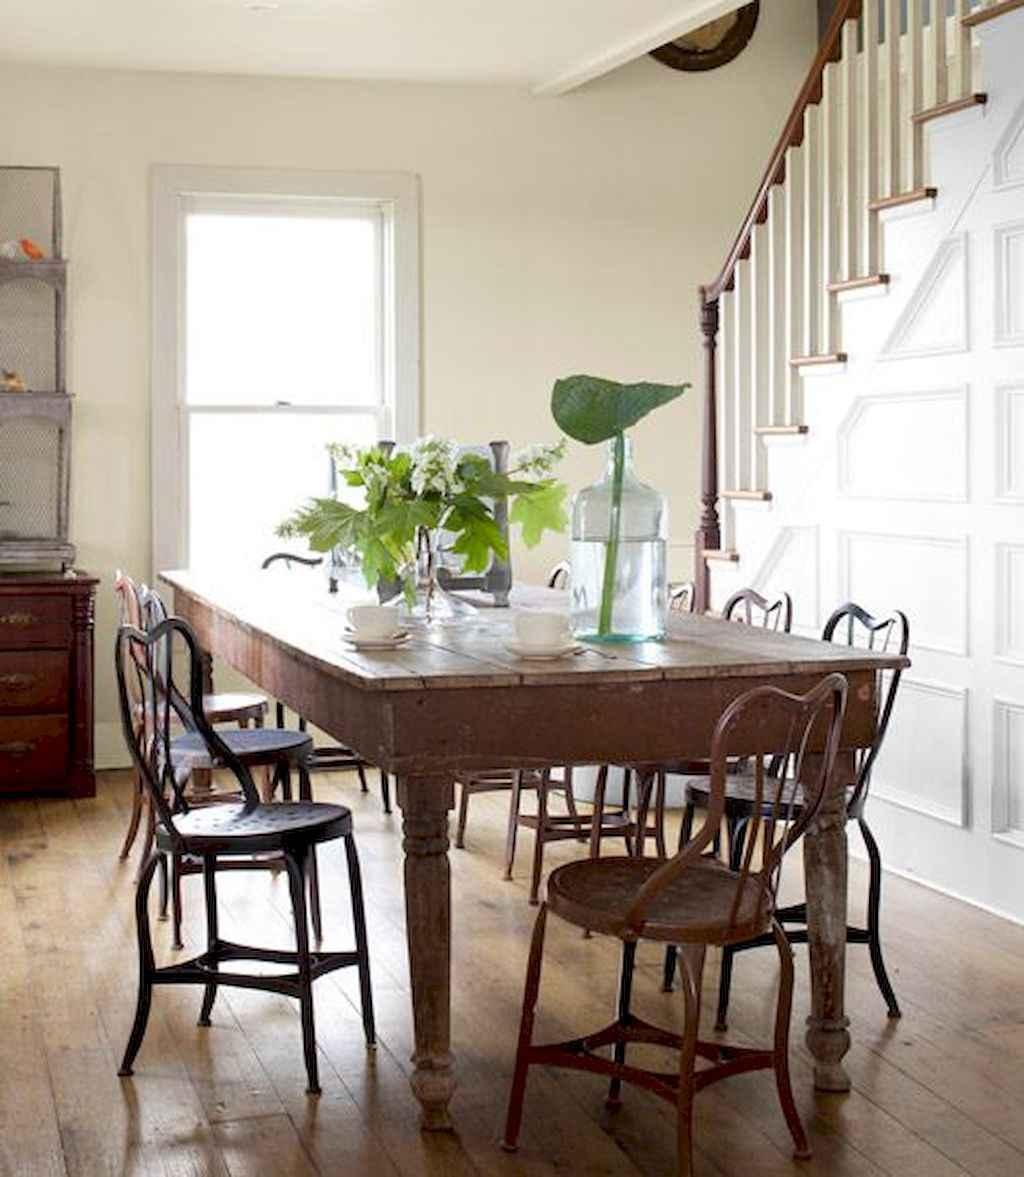 100 Rustic Farmhouse Dining Room Decor Ideas (10)